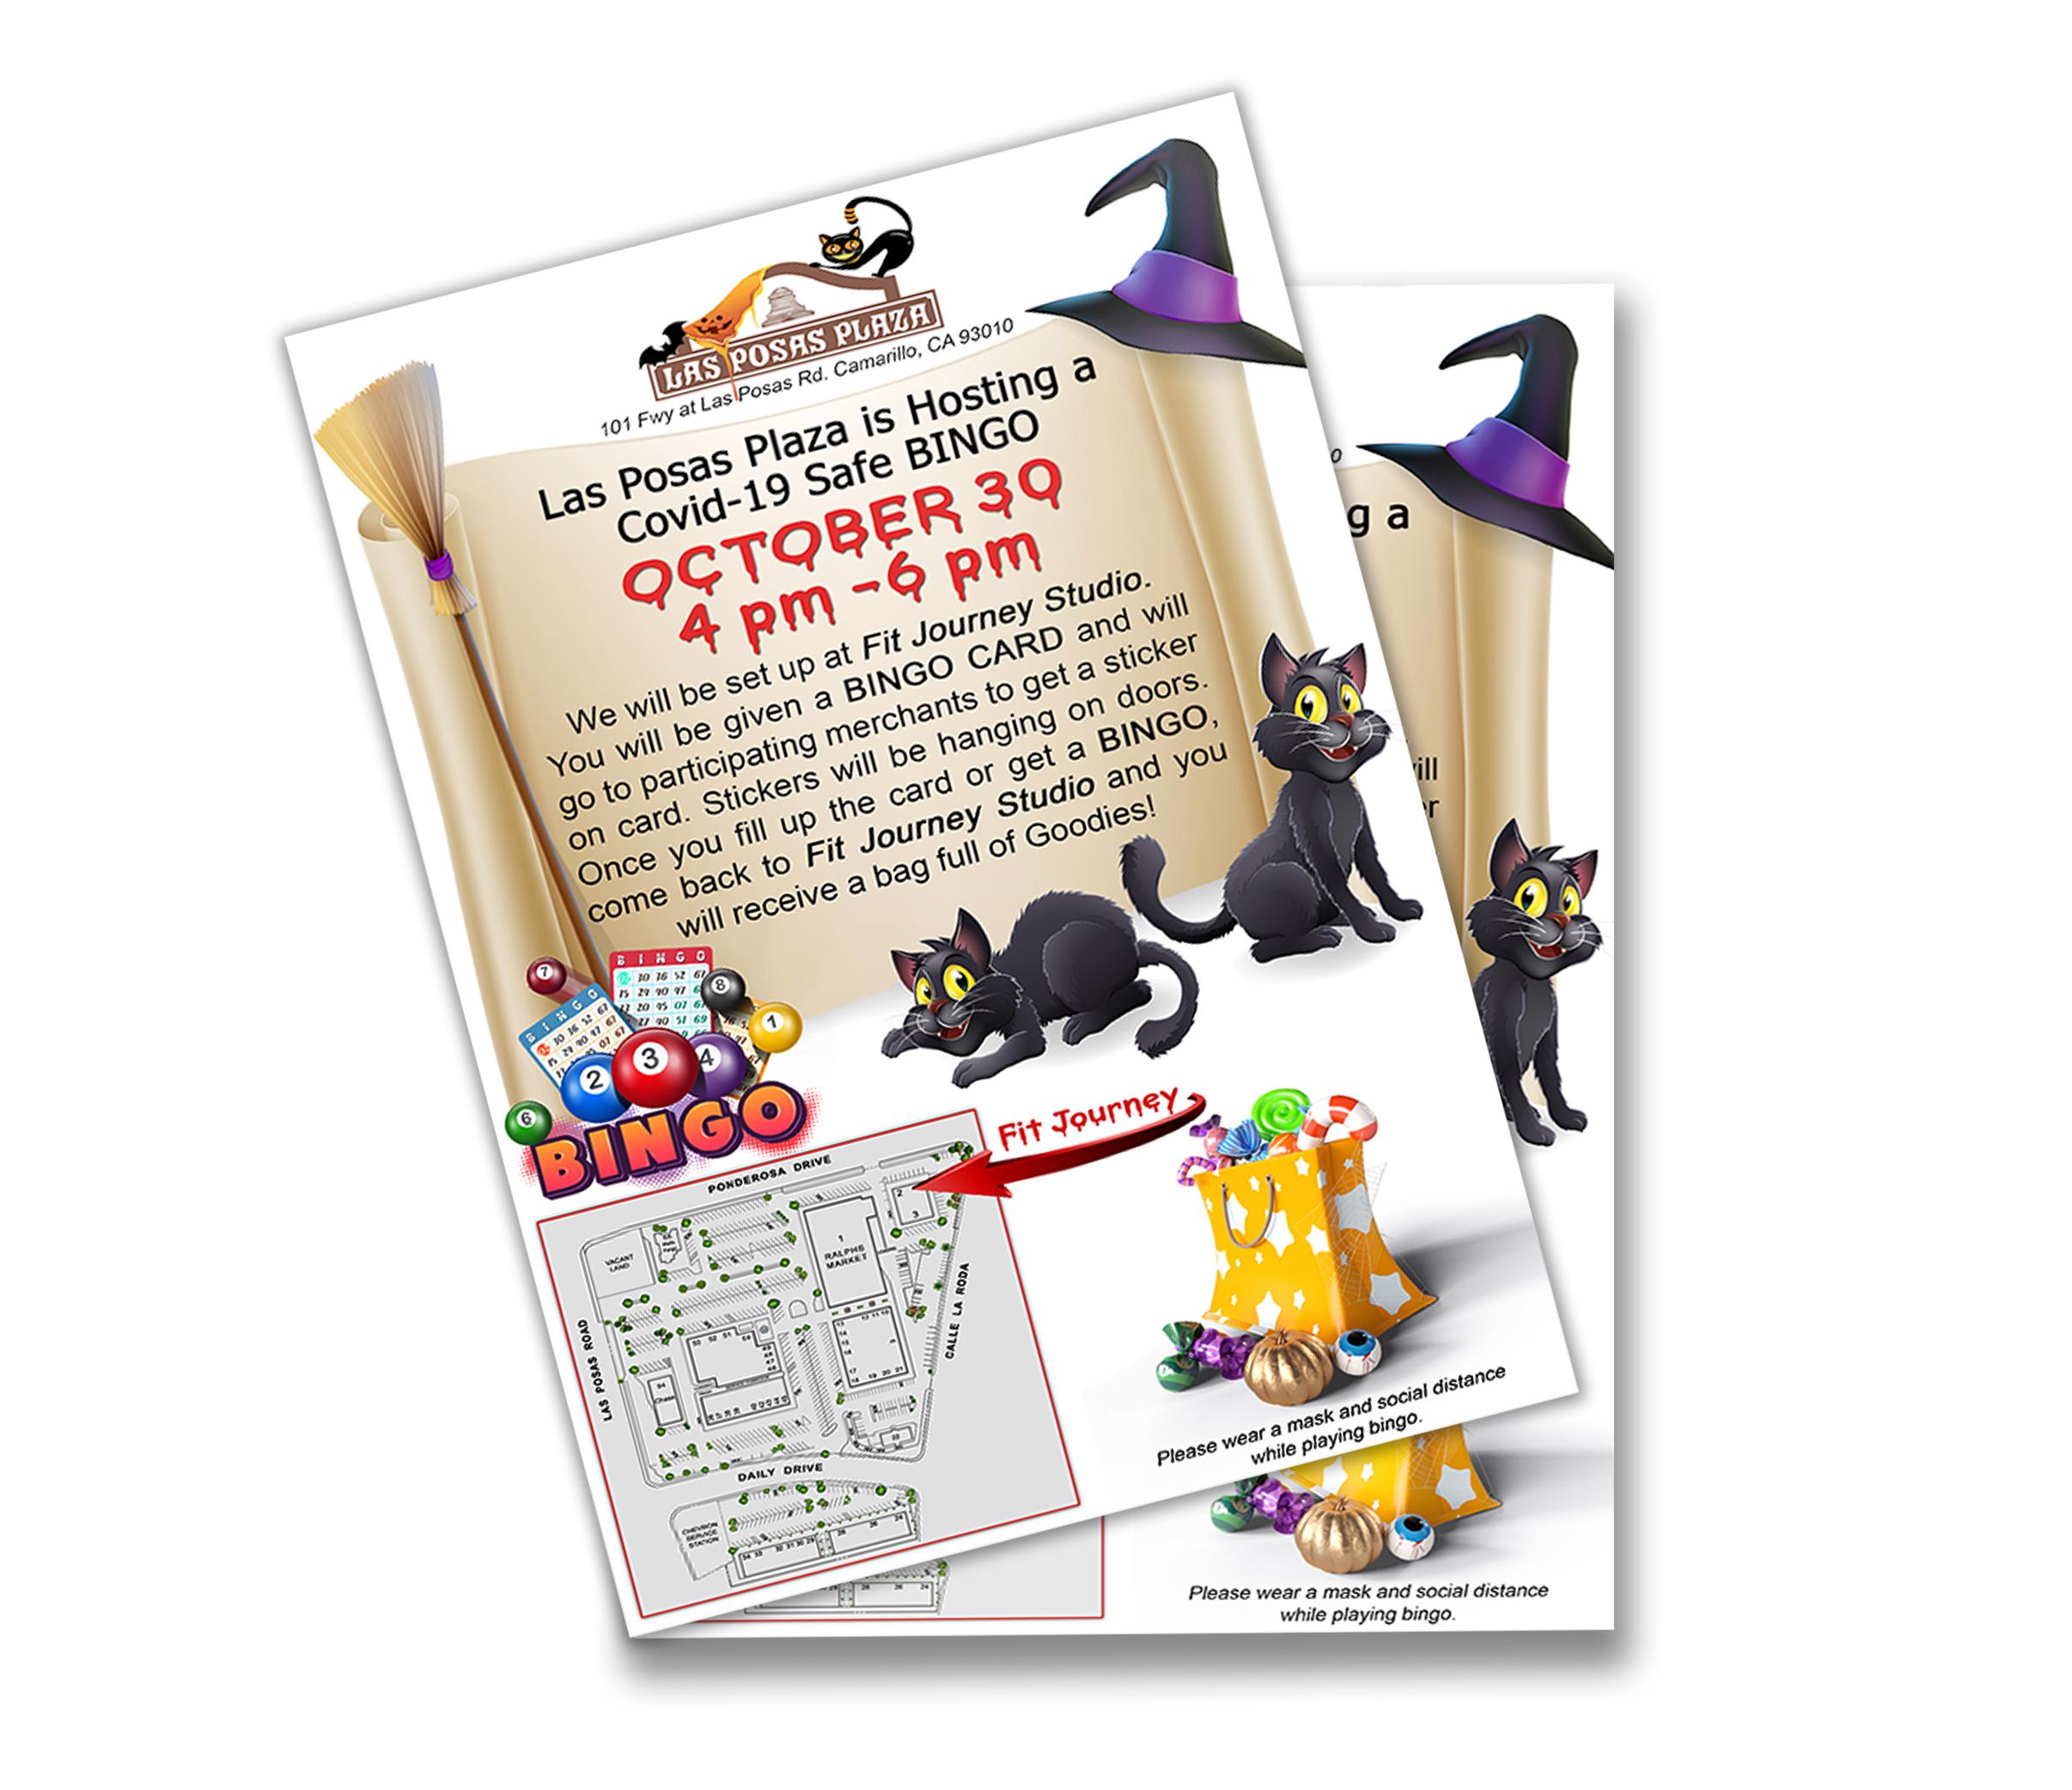 Halloween Bingo Flyer 2020